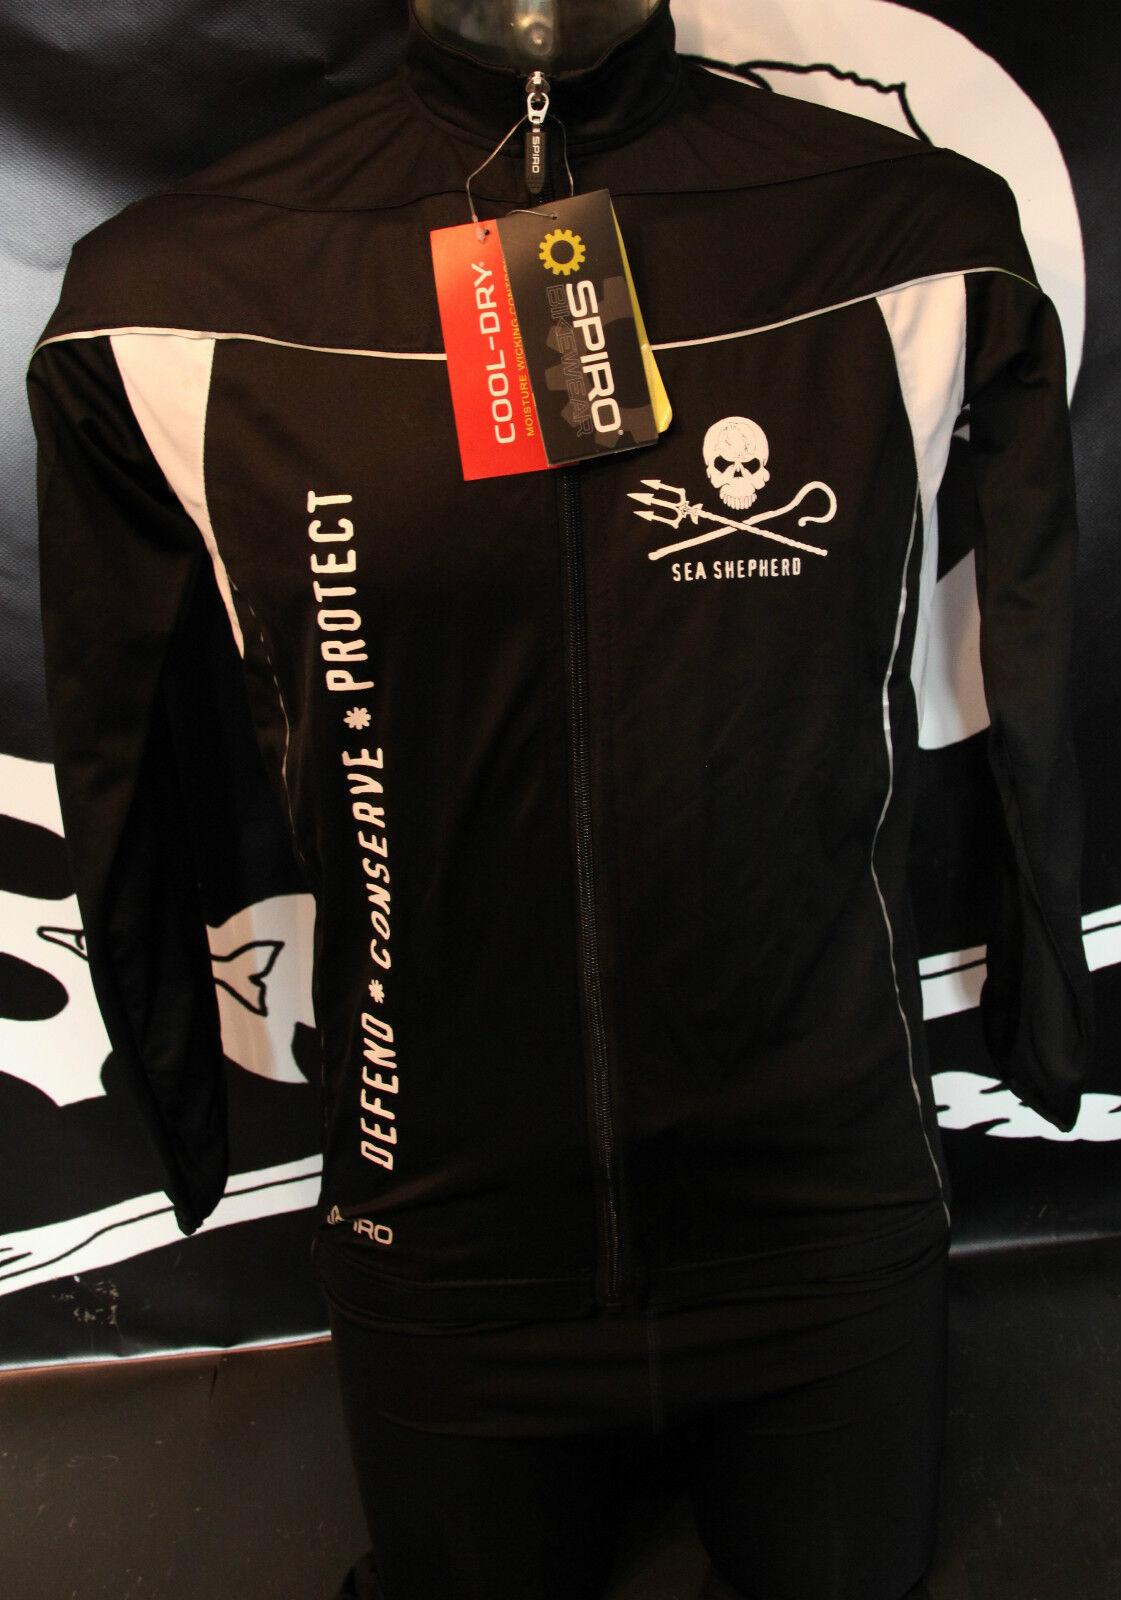 Sea Roger Shepherd Jolly Roger Sea cycle, cyclisme, spiro, Bikewear, crâne unisexe e23d19